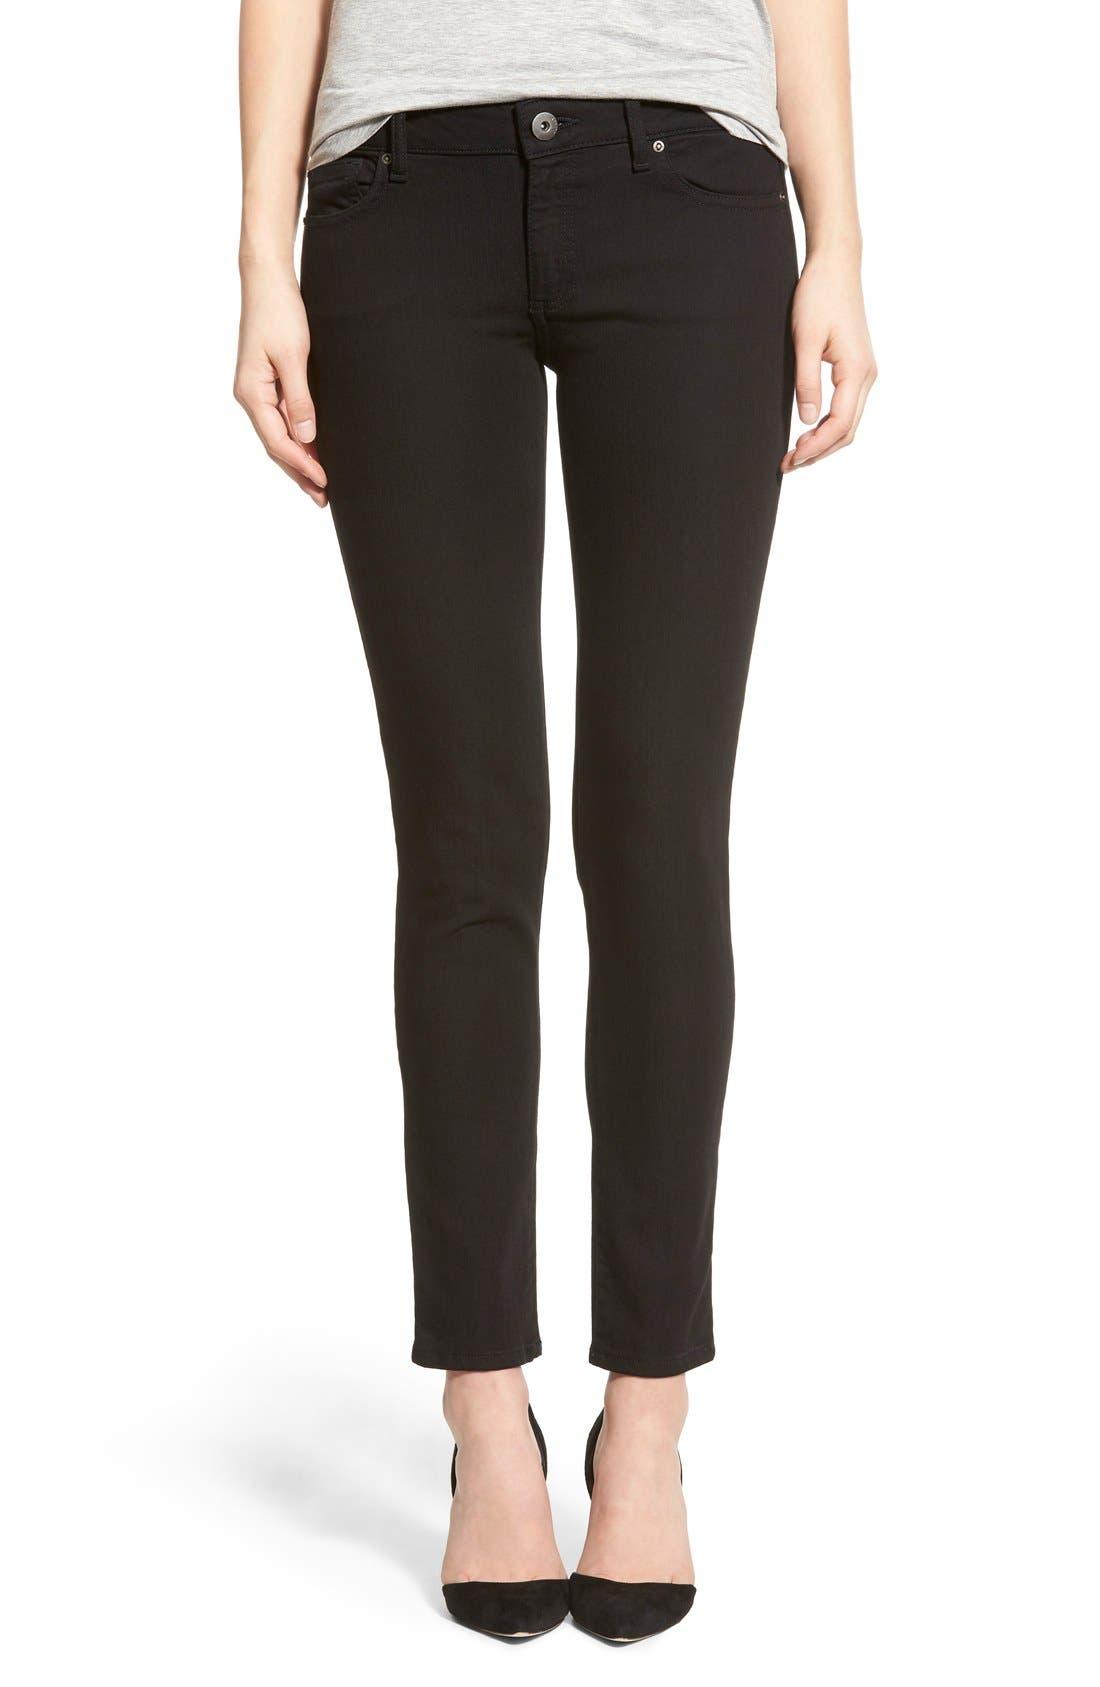 DL1961 'Emma' Power Legging Jeans